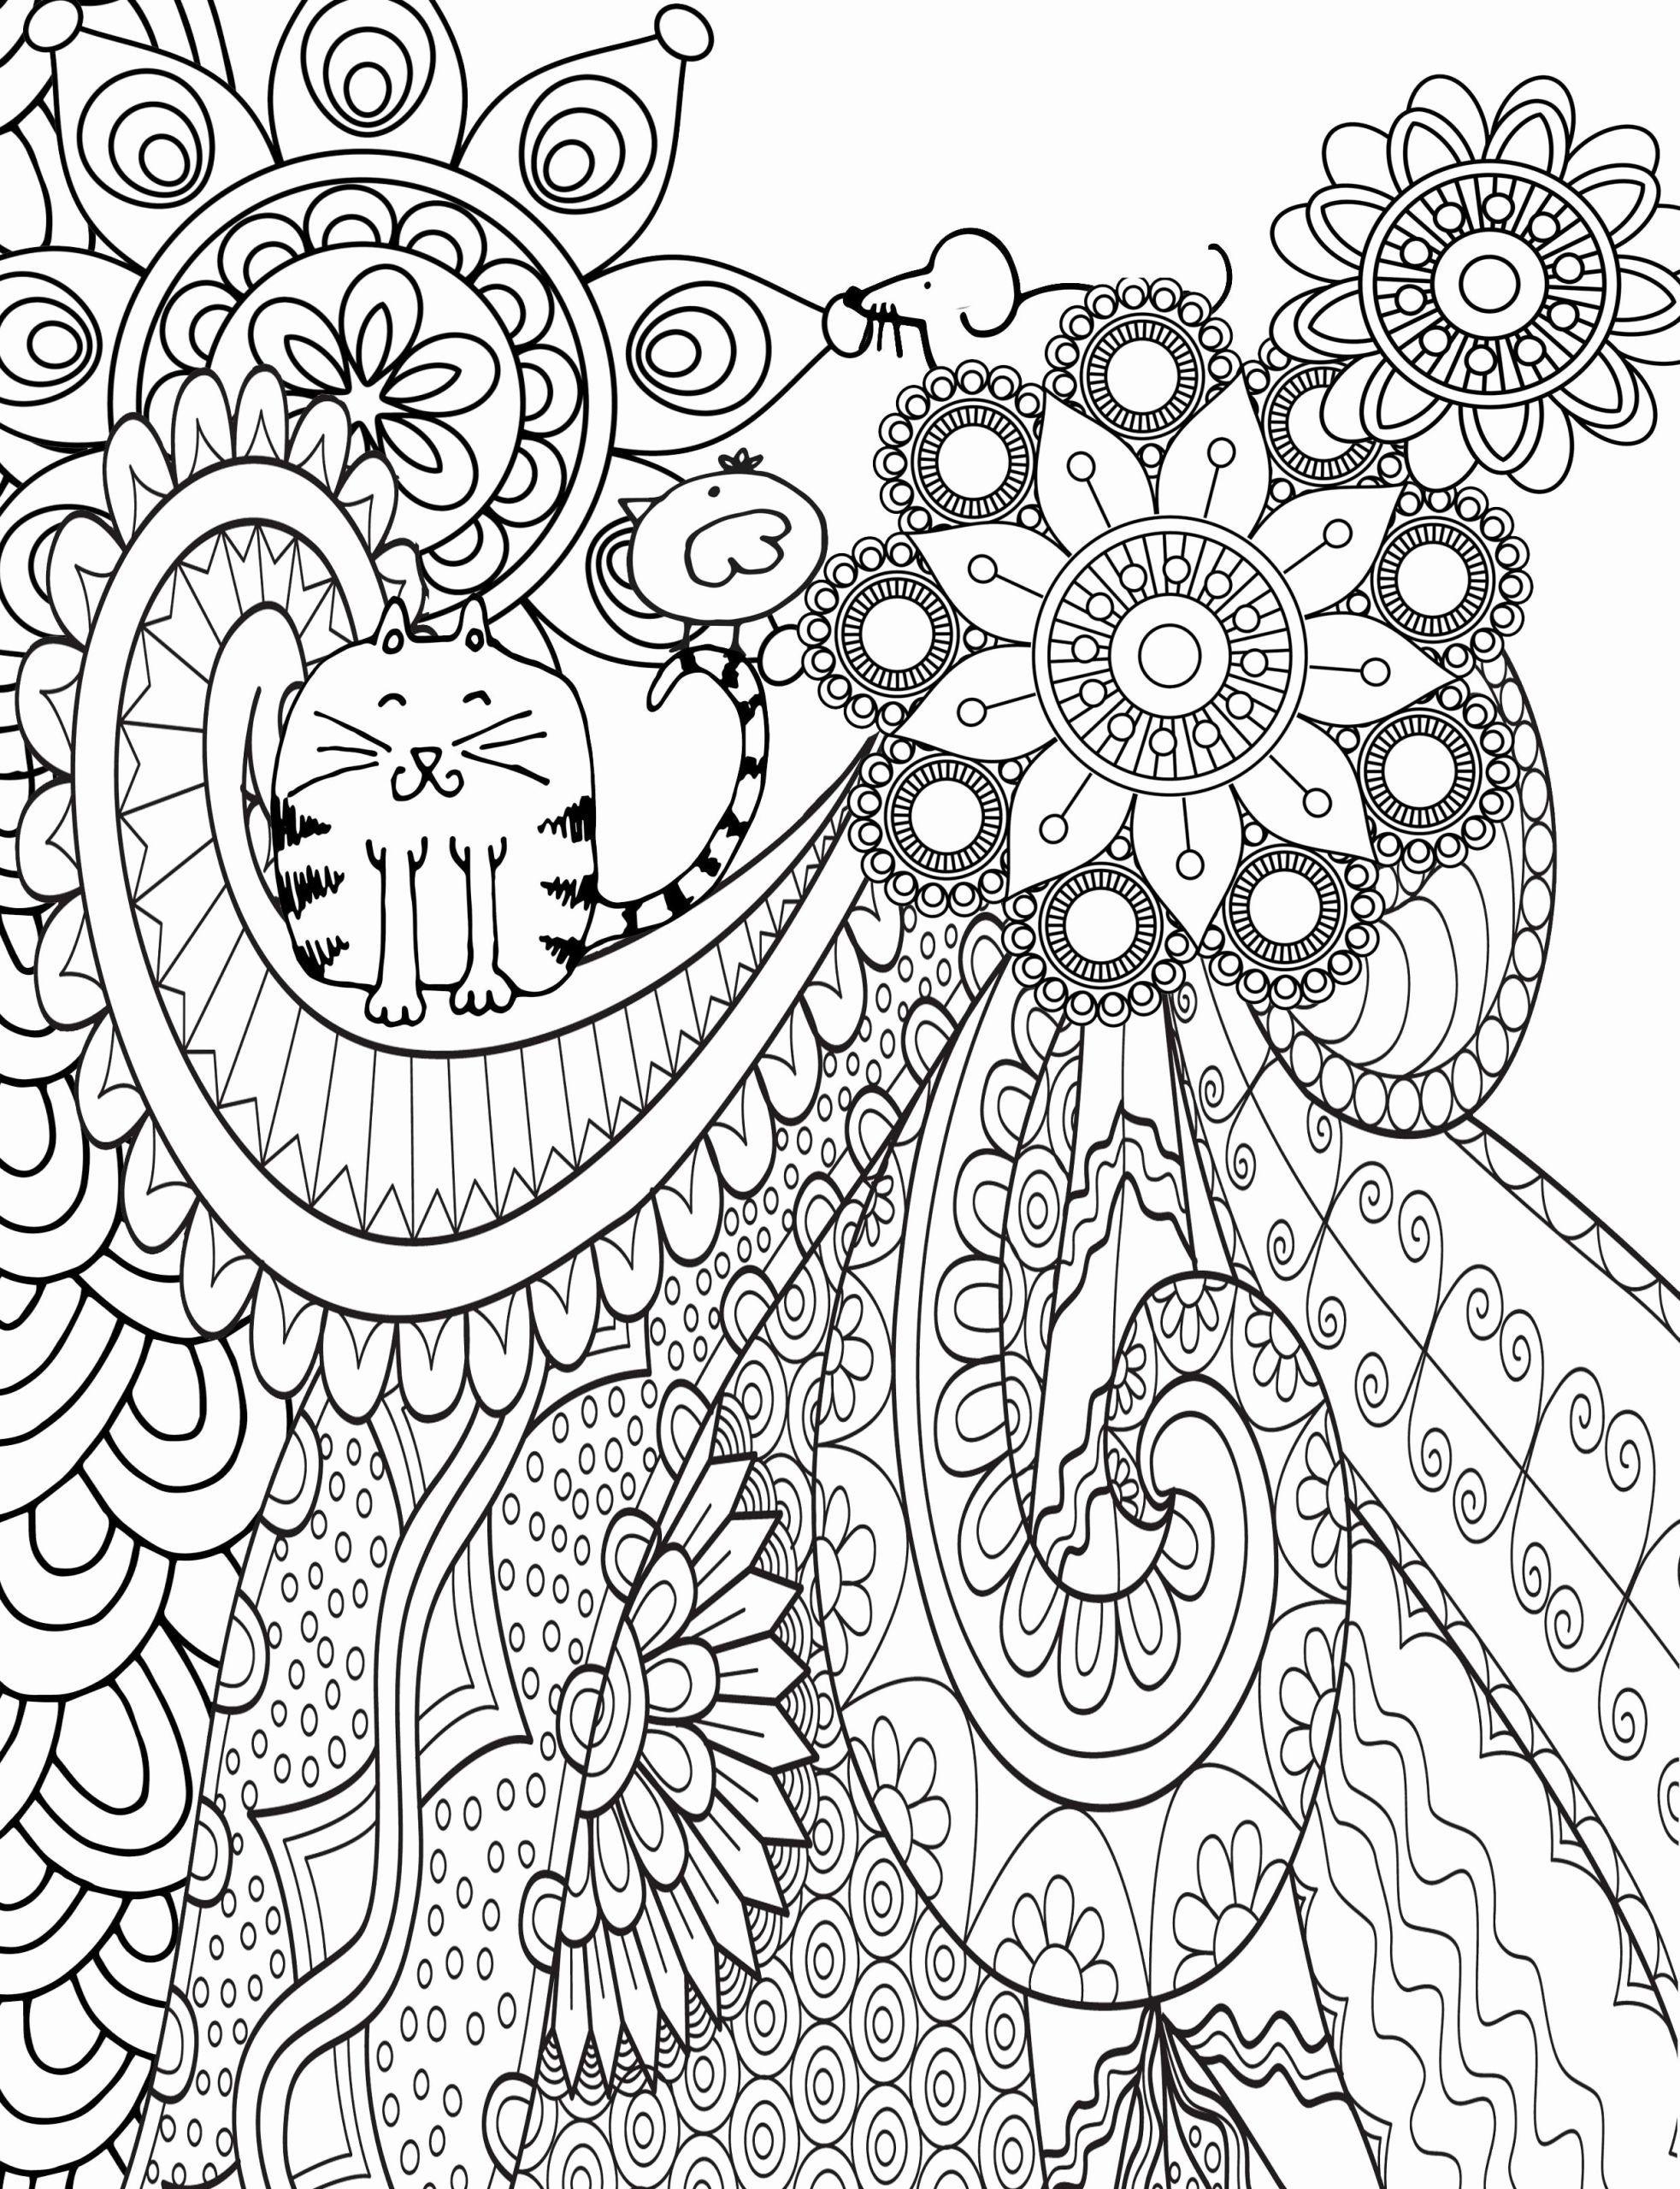 Dna Replication Coloring Worksheet Lovely Unit 12 Dna